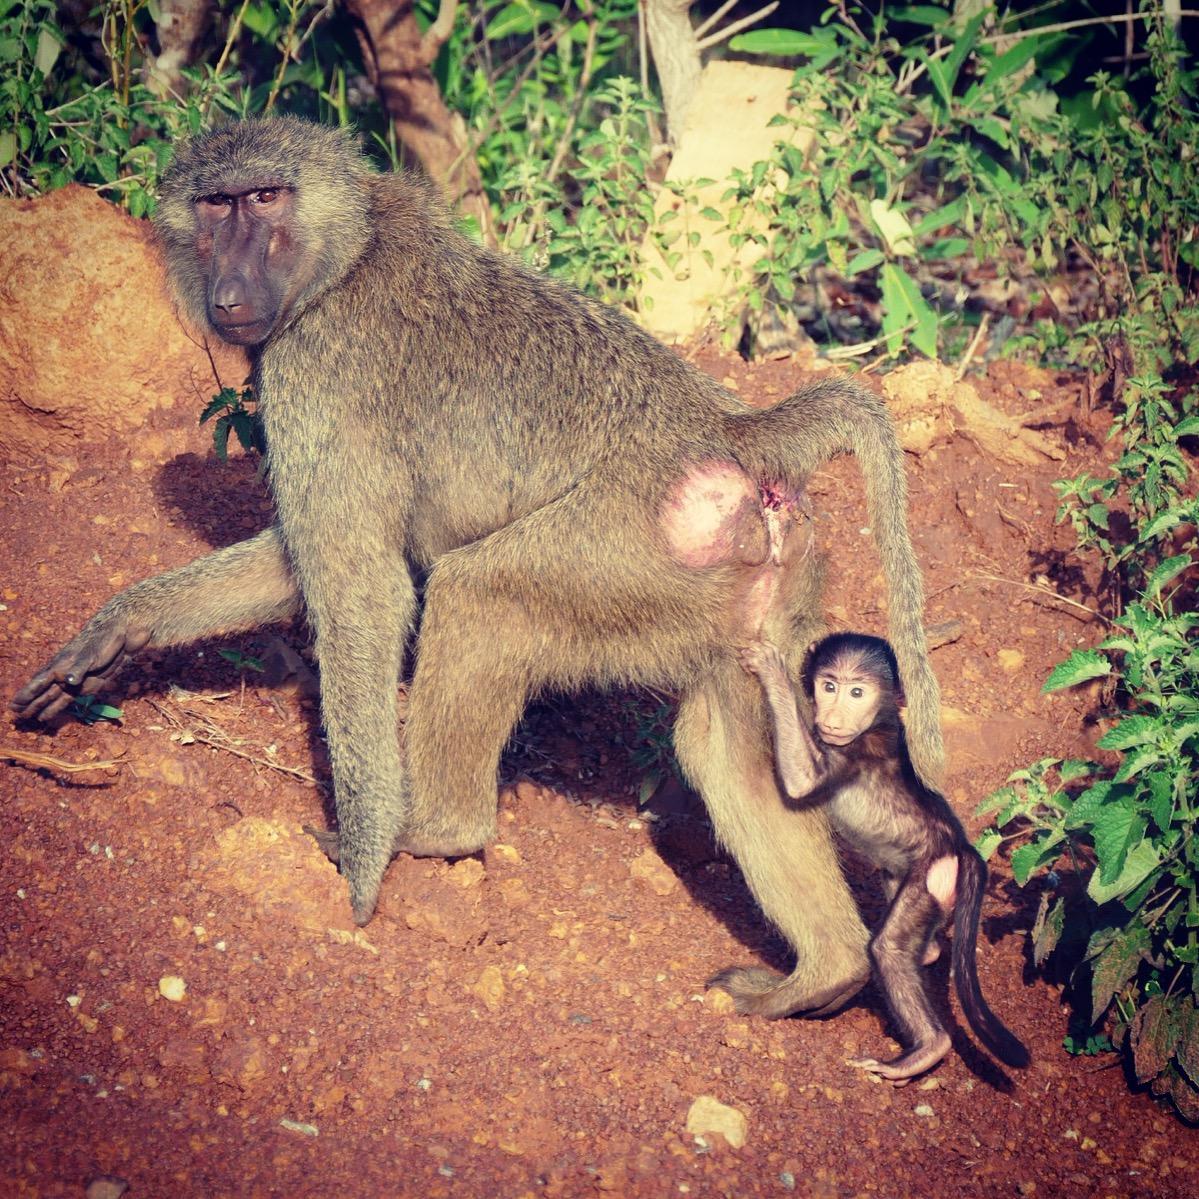 Noah's view of a baboon with baby at Mole National Park. Noah Strycker